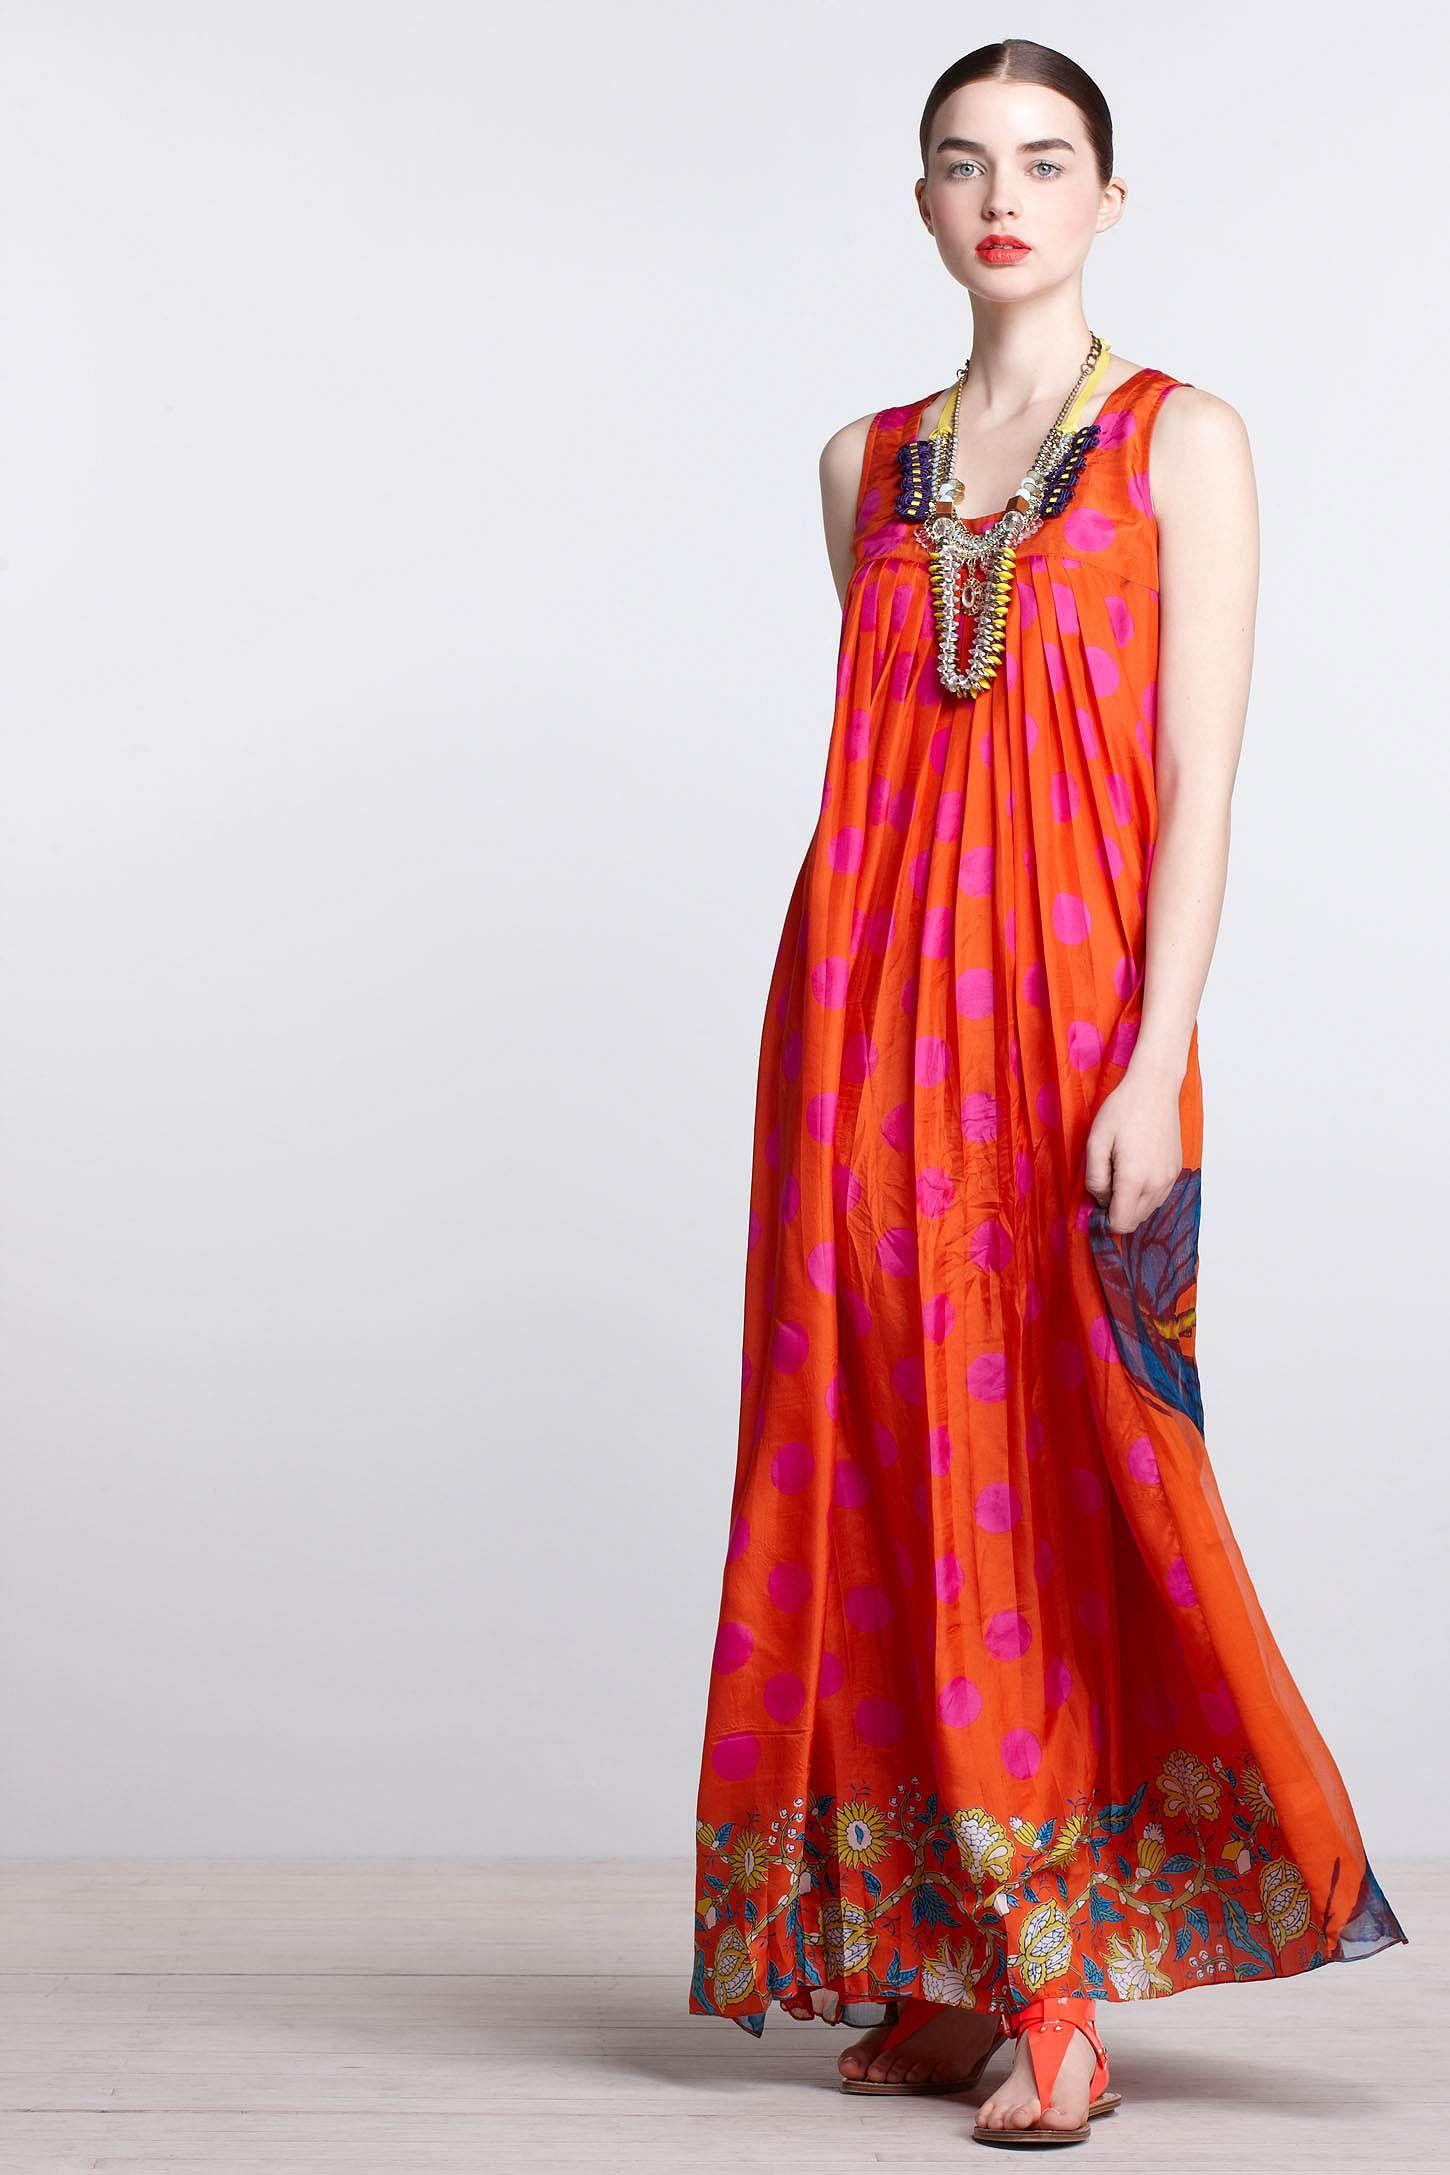 Maxi dress mami pinterest anthropologie and maxi dresses